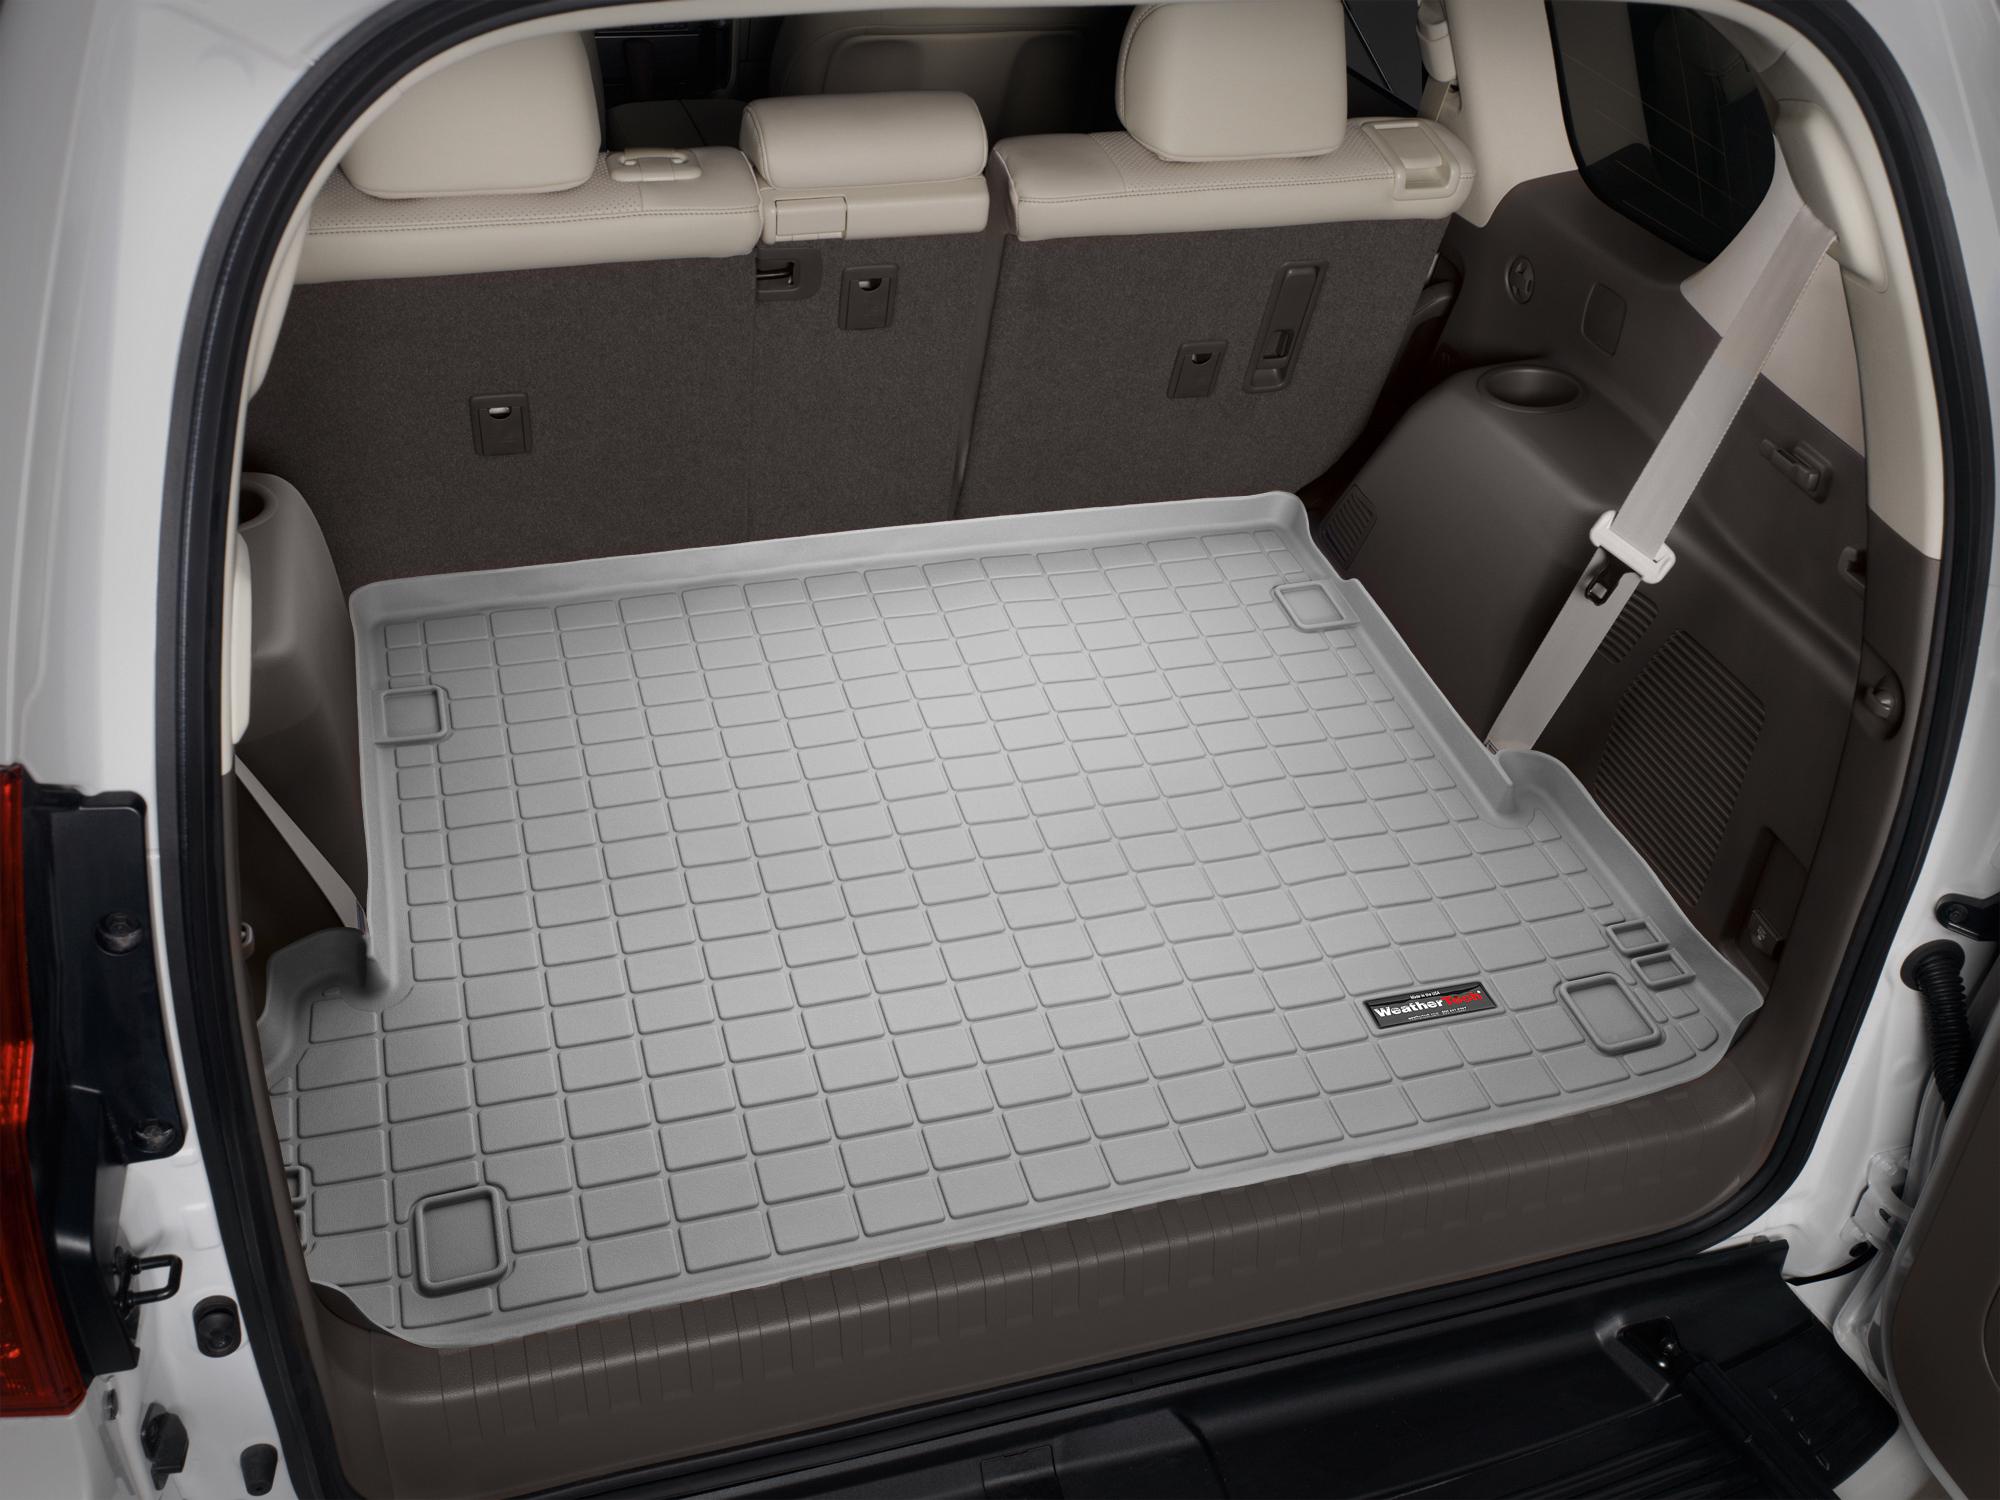 Toyota Land Cruiser 150 2010>2017 Vasca baule tappeto bagagliaio grigio *1239